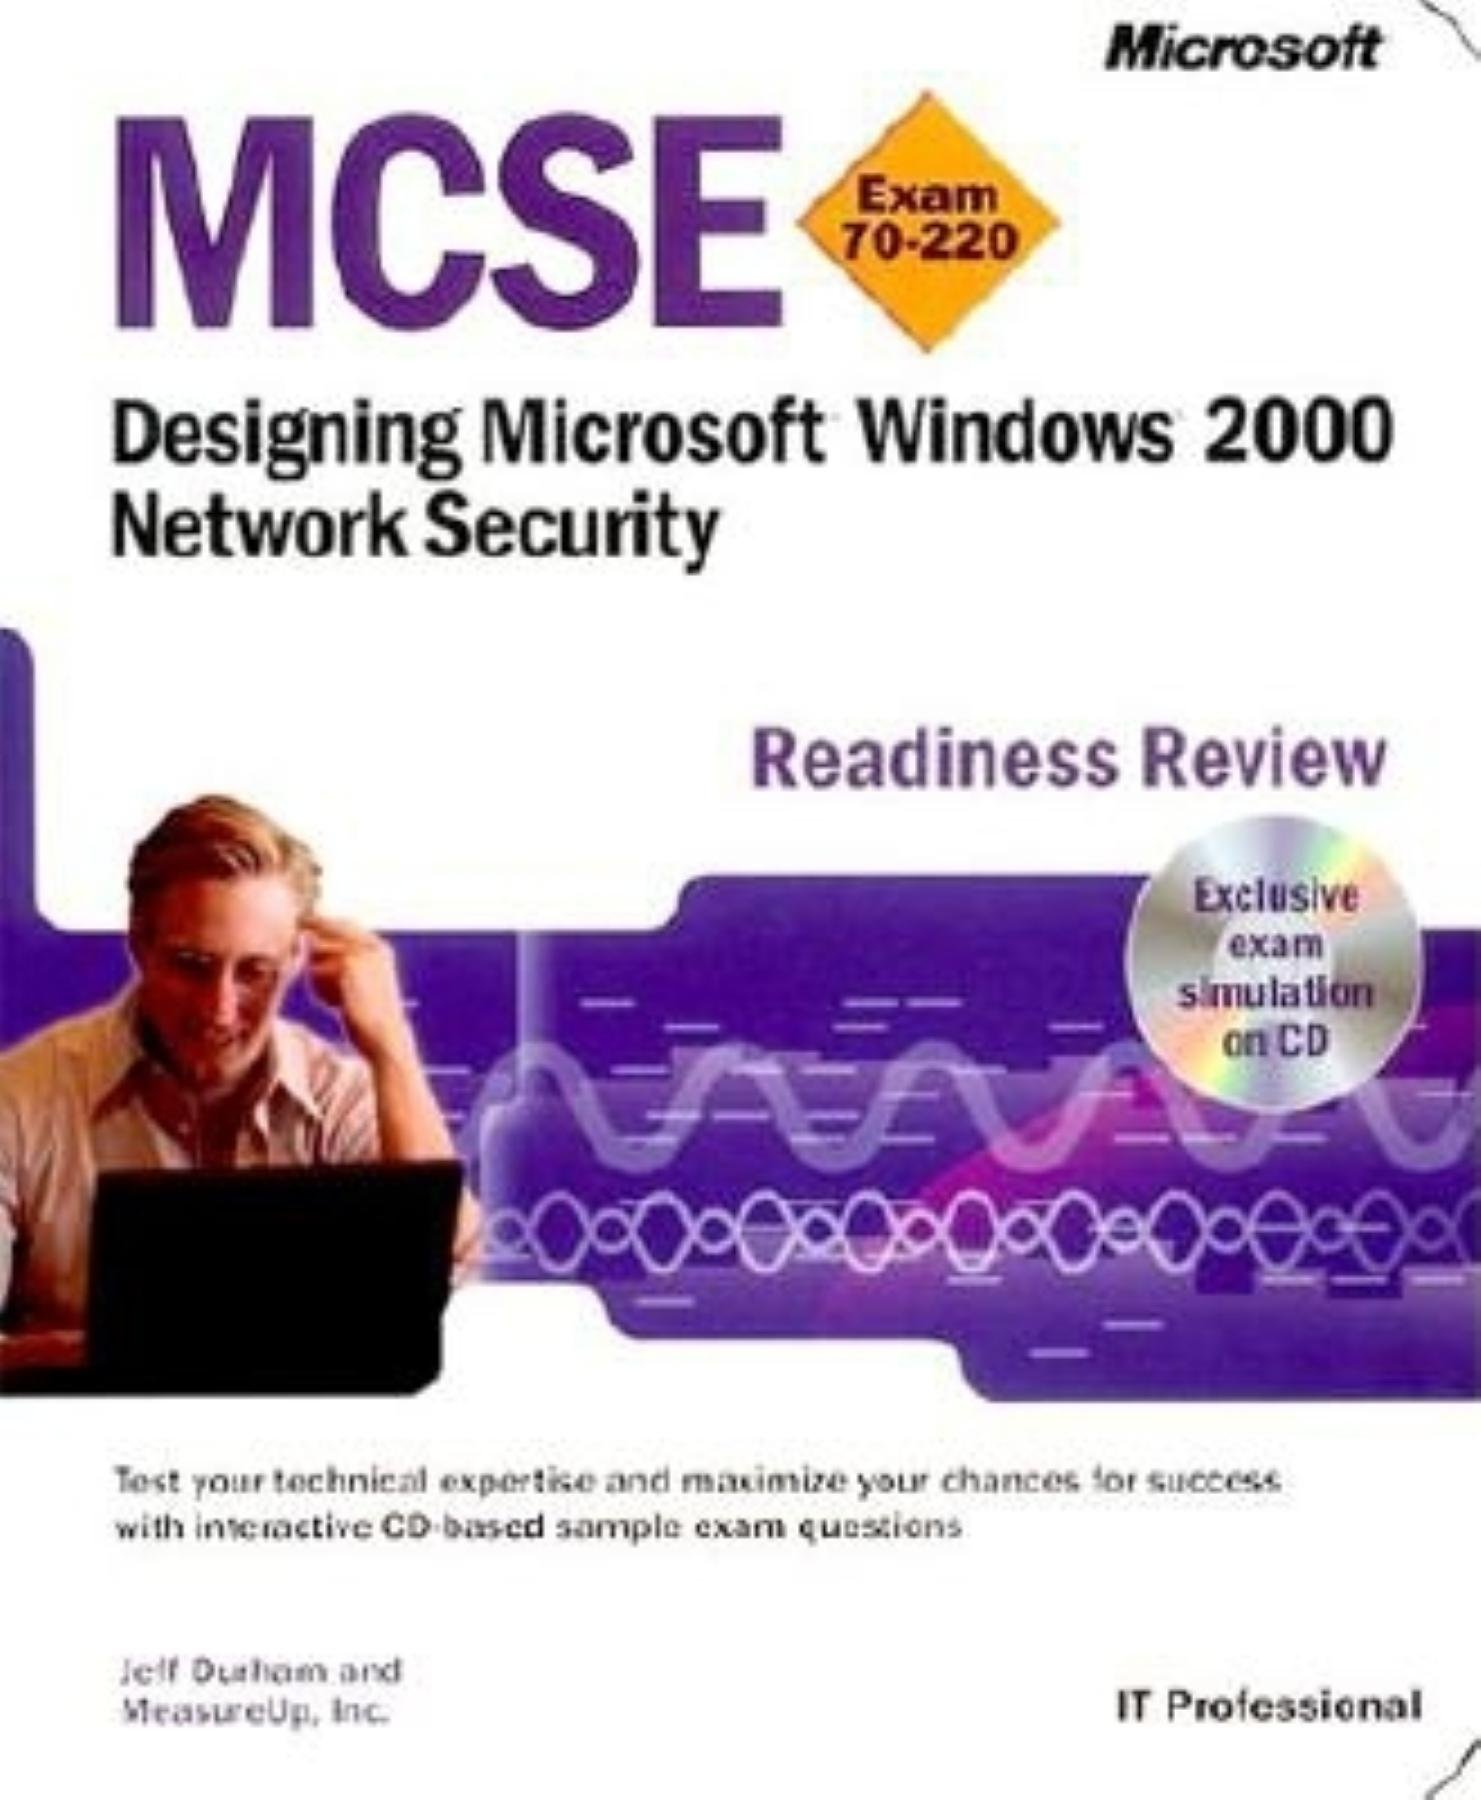 Mcse Designing Microsoft Windows 2000 Network Security Readiness